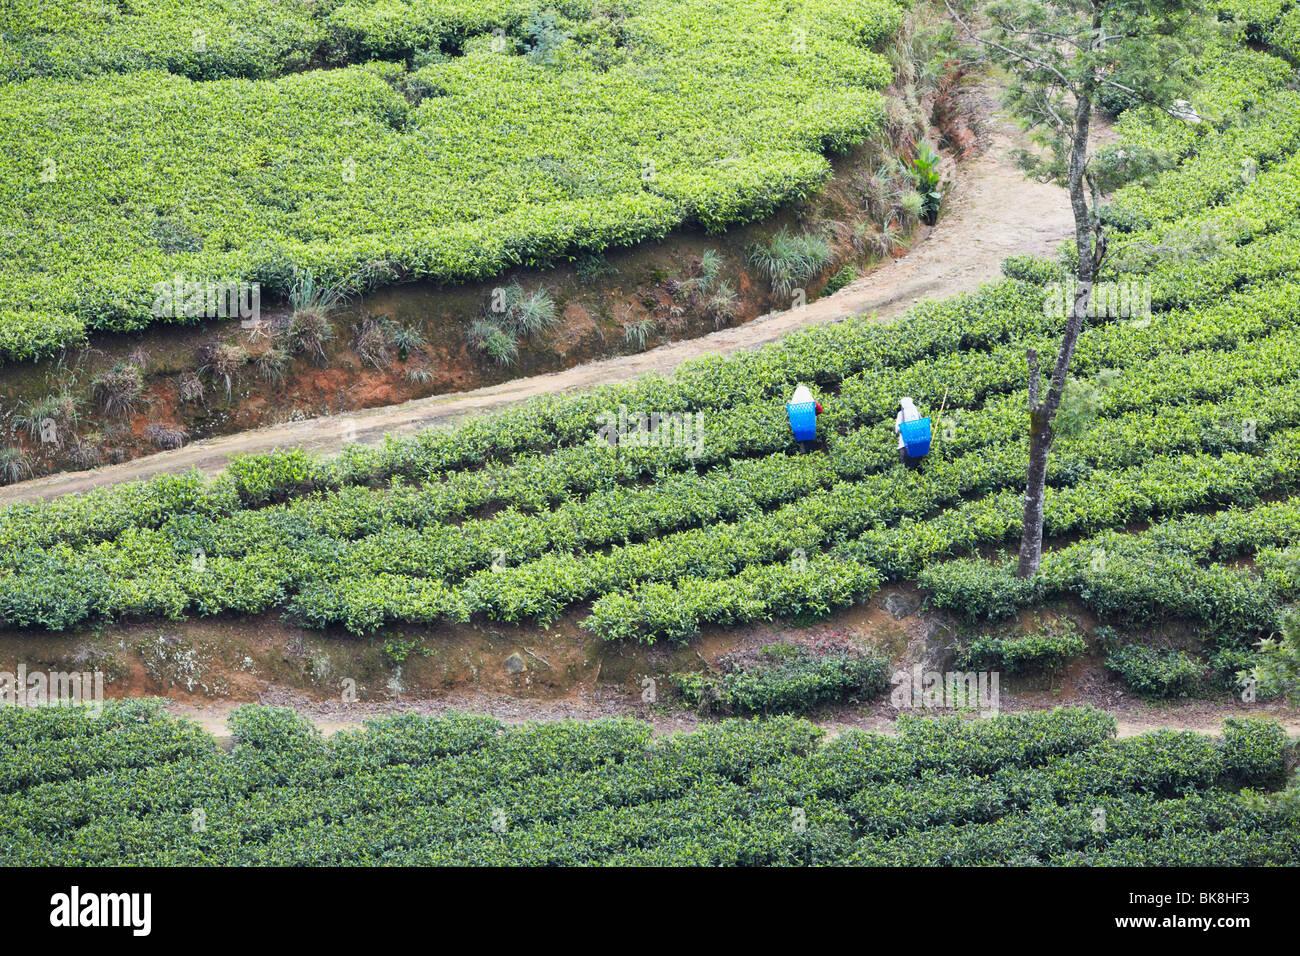 Les cueilleurs de thé à Pedro de thé, Nuwara Eliya, Sri Lanka Photo Stock